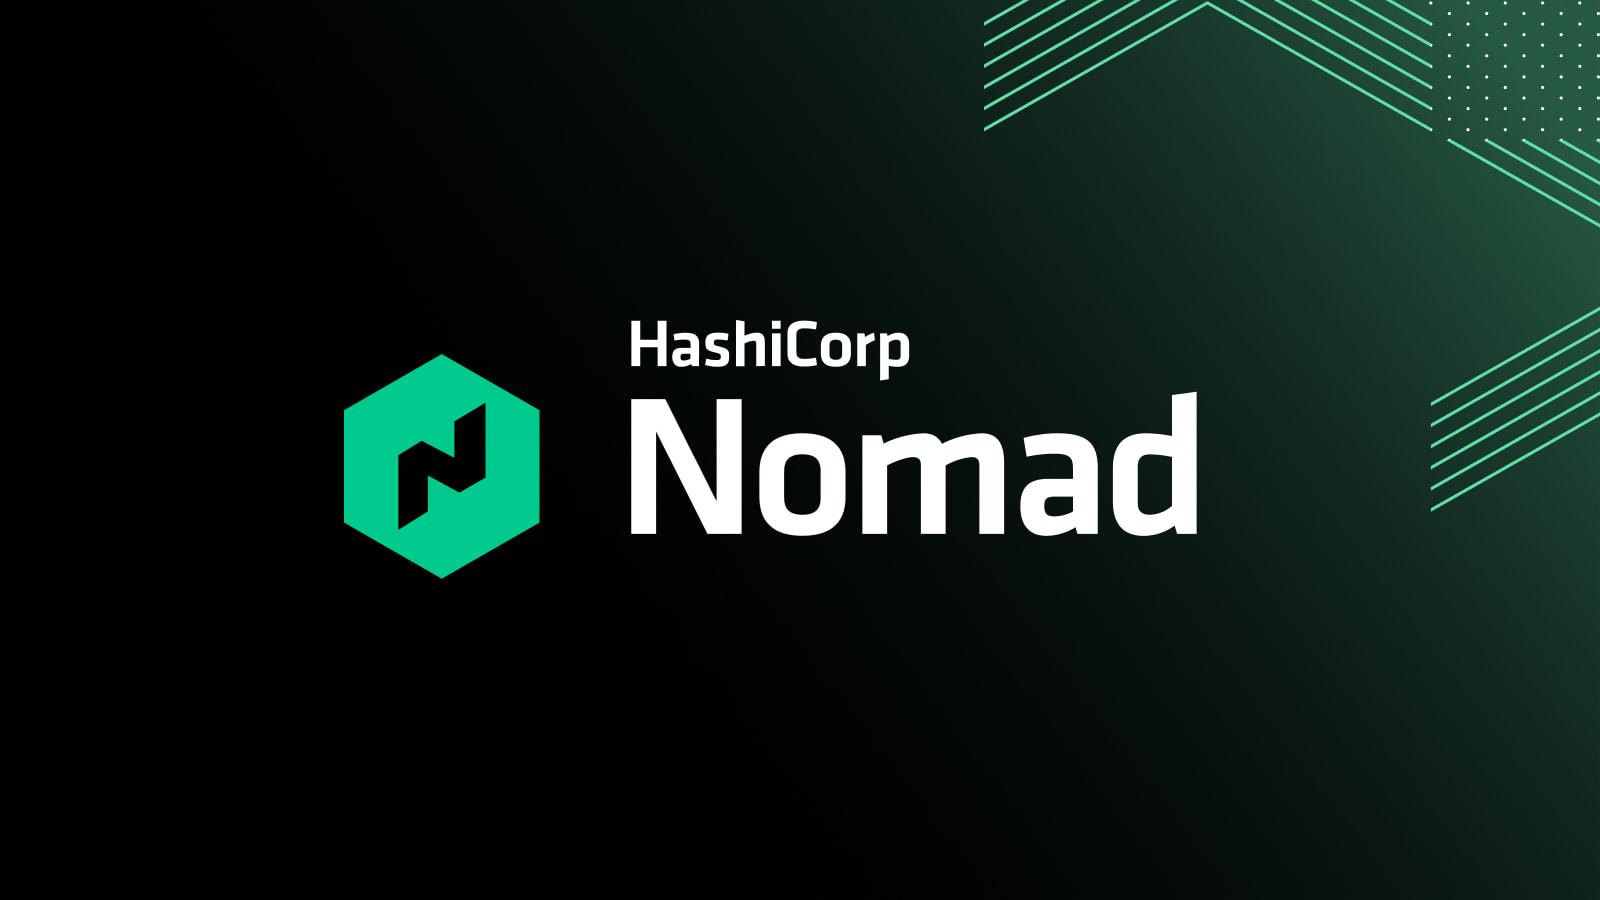 Announcing HashiCorp Nomad 1.2 Beta